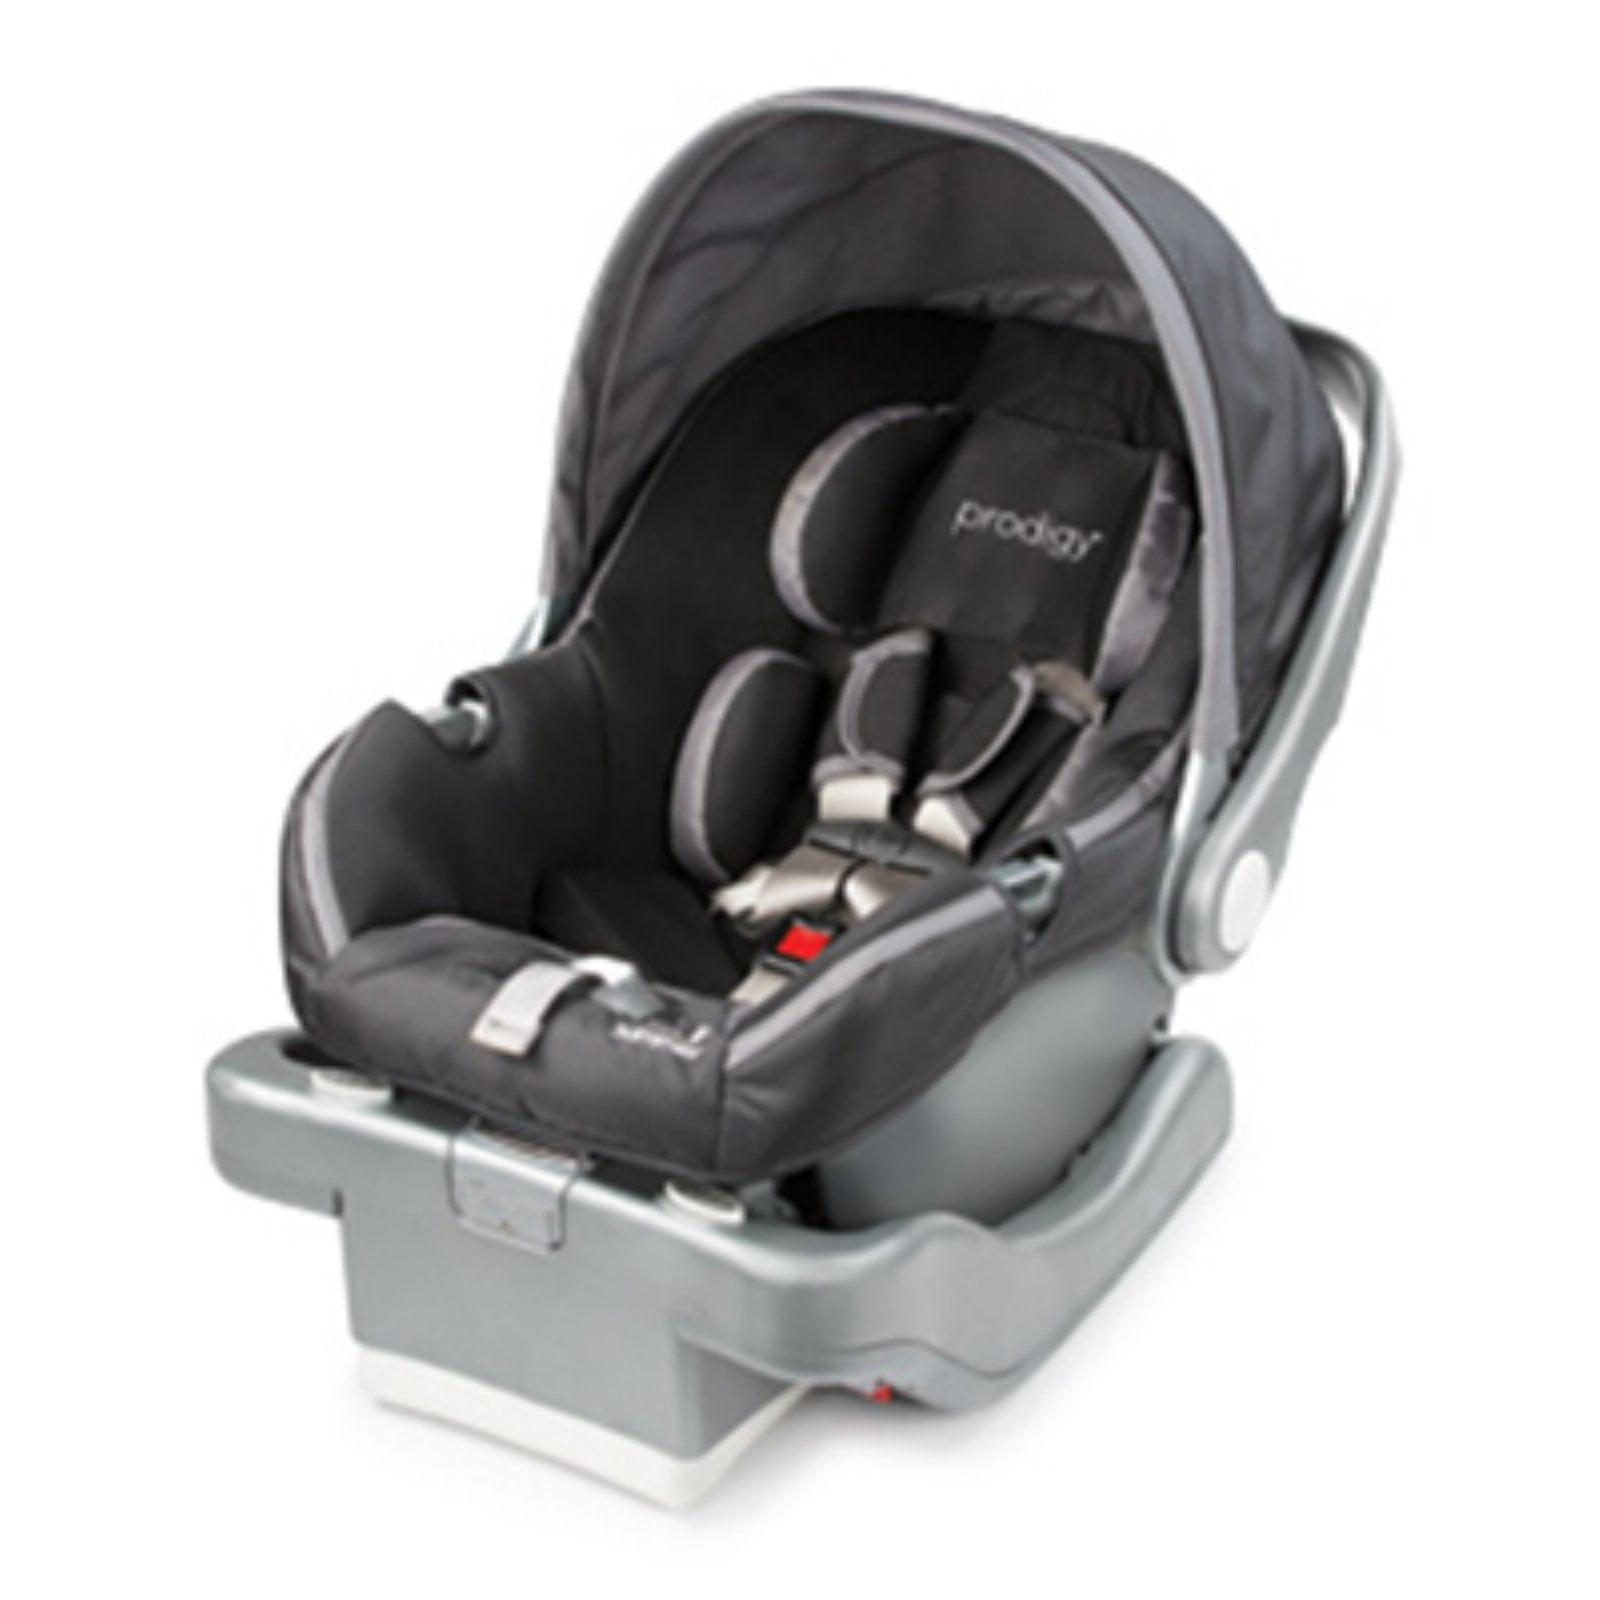 Summer Infant Prodigy Infant Car Seat, Blaze